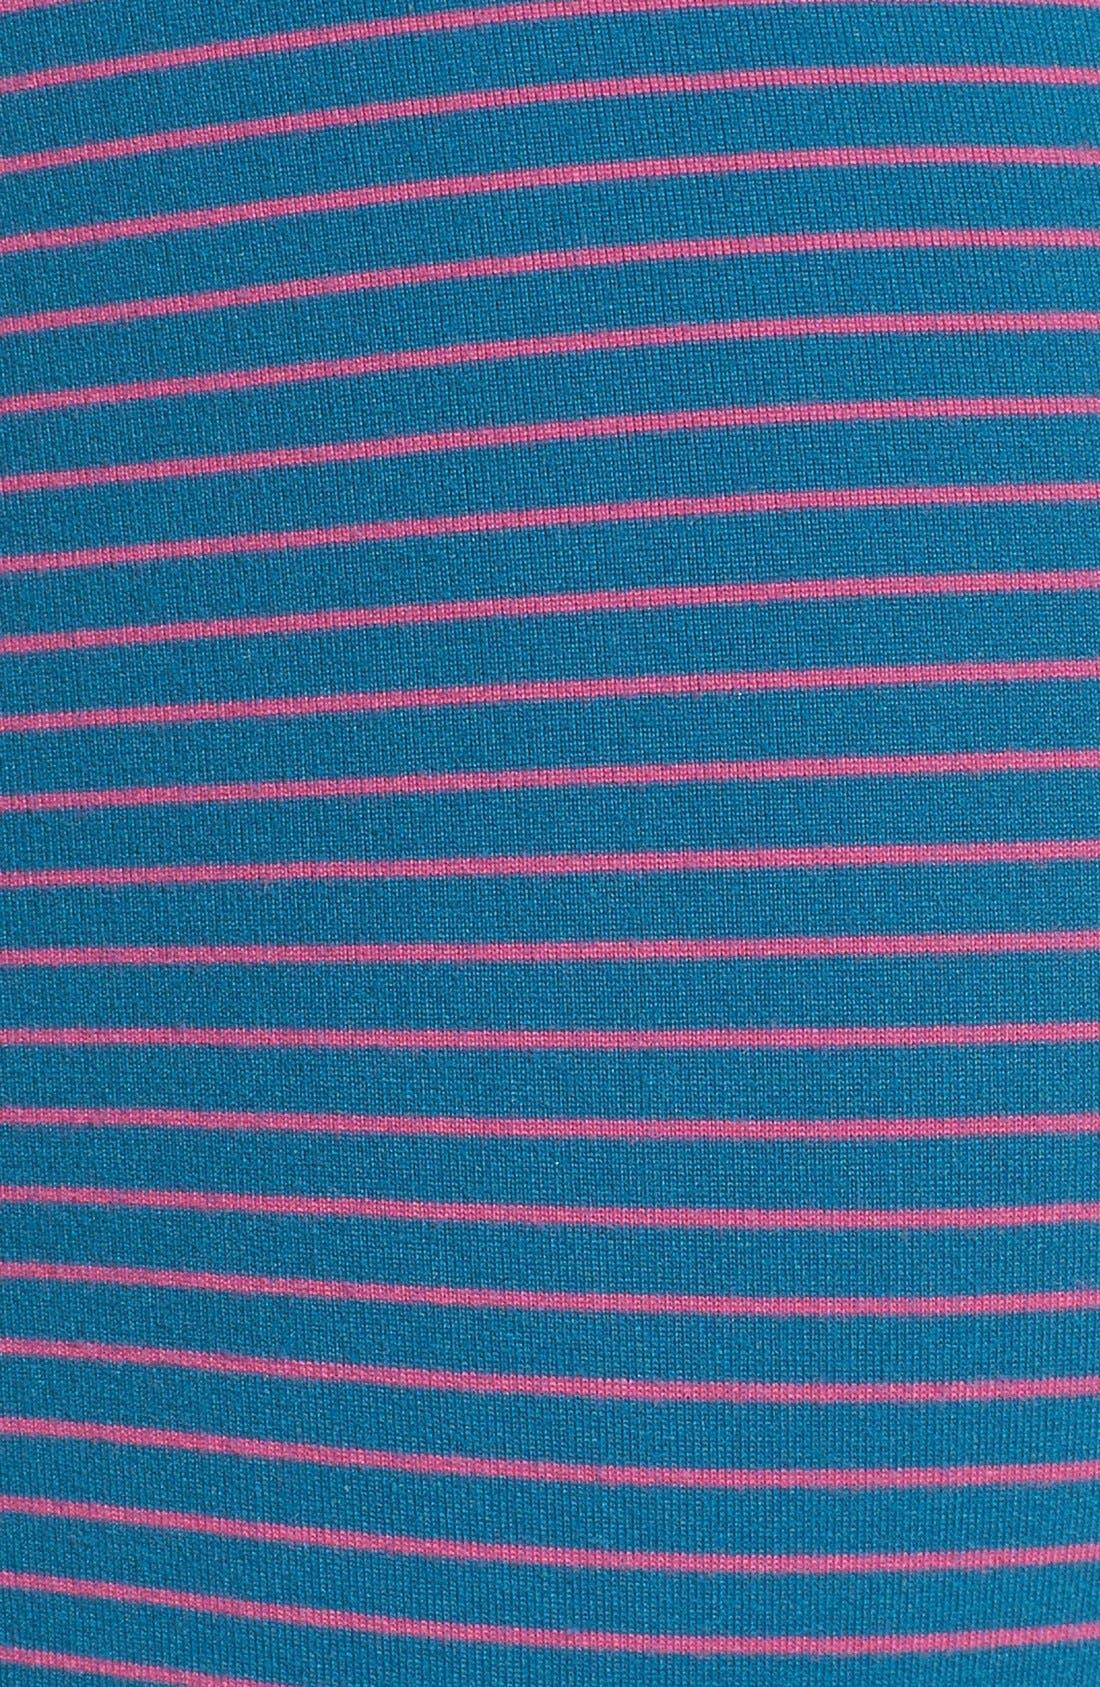 'Steel - U2715' Microfiber Hip Briefs,                             Alternate thumbnail 61, color,